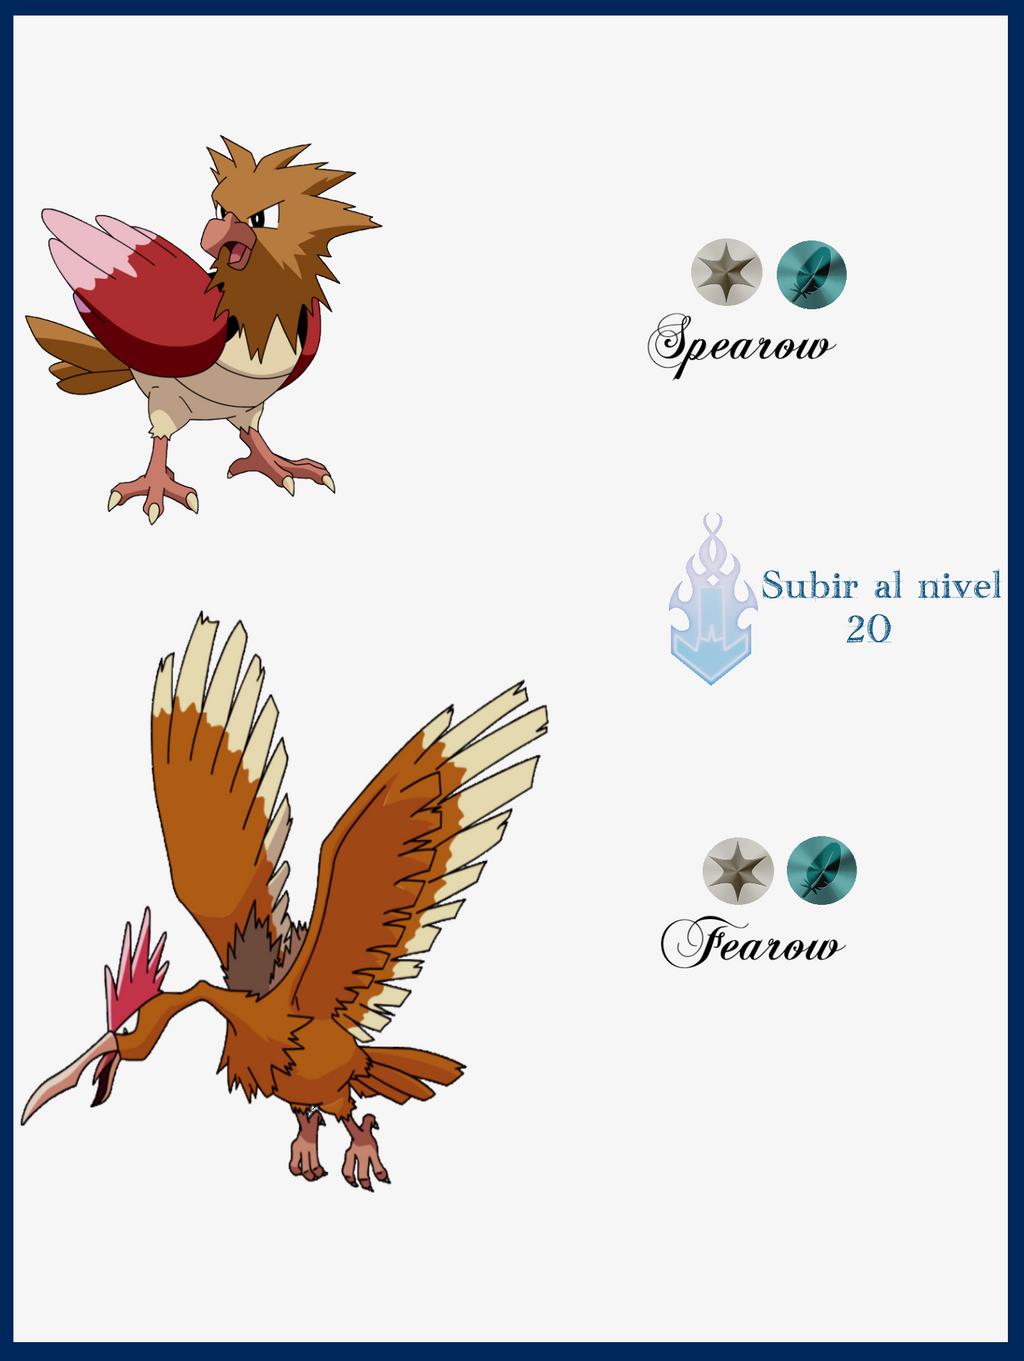 Pokemon Spearow Evolution Images | Pokemon Images